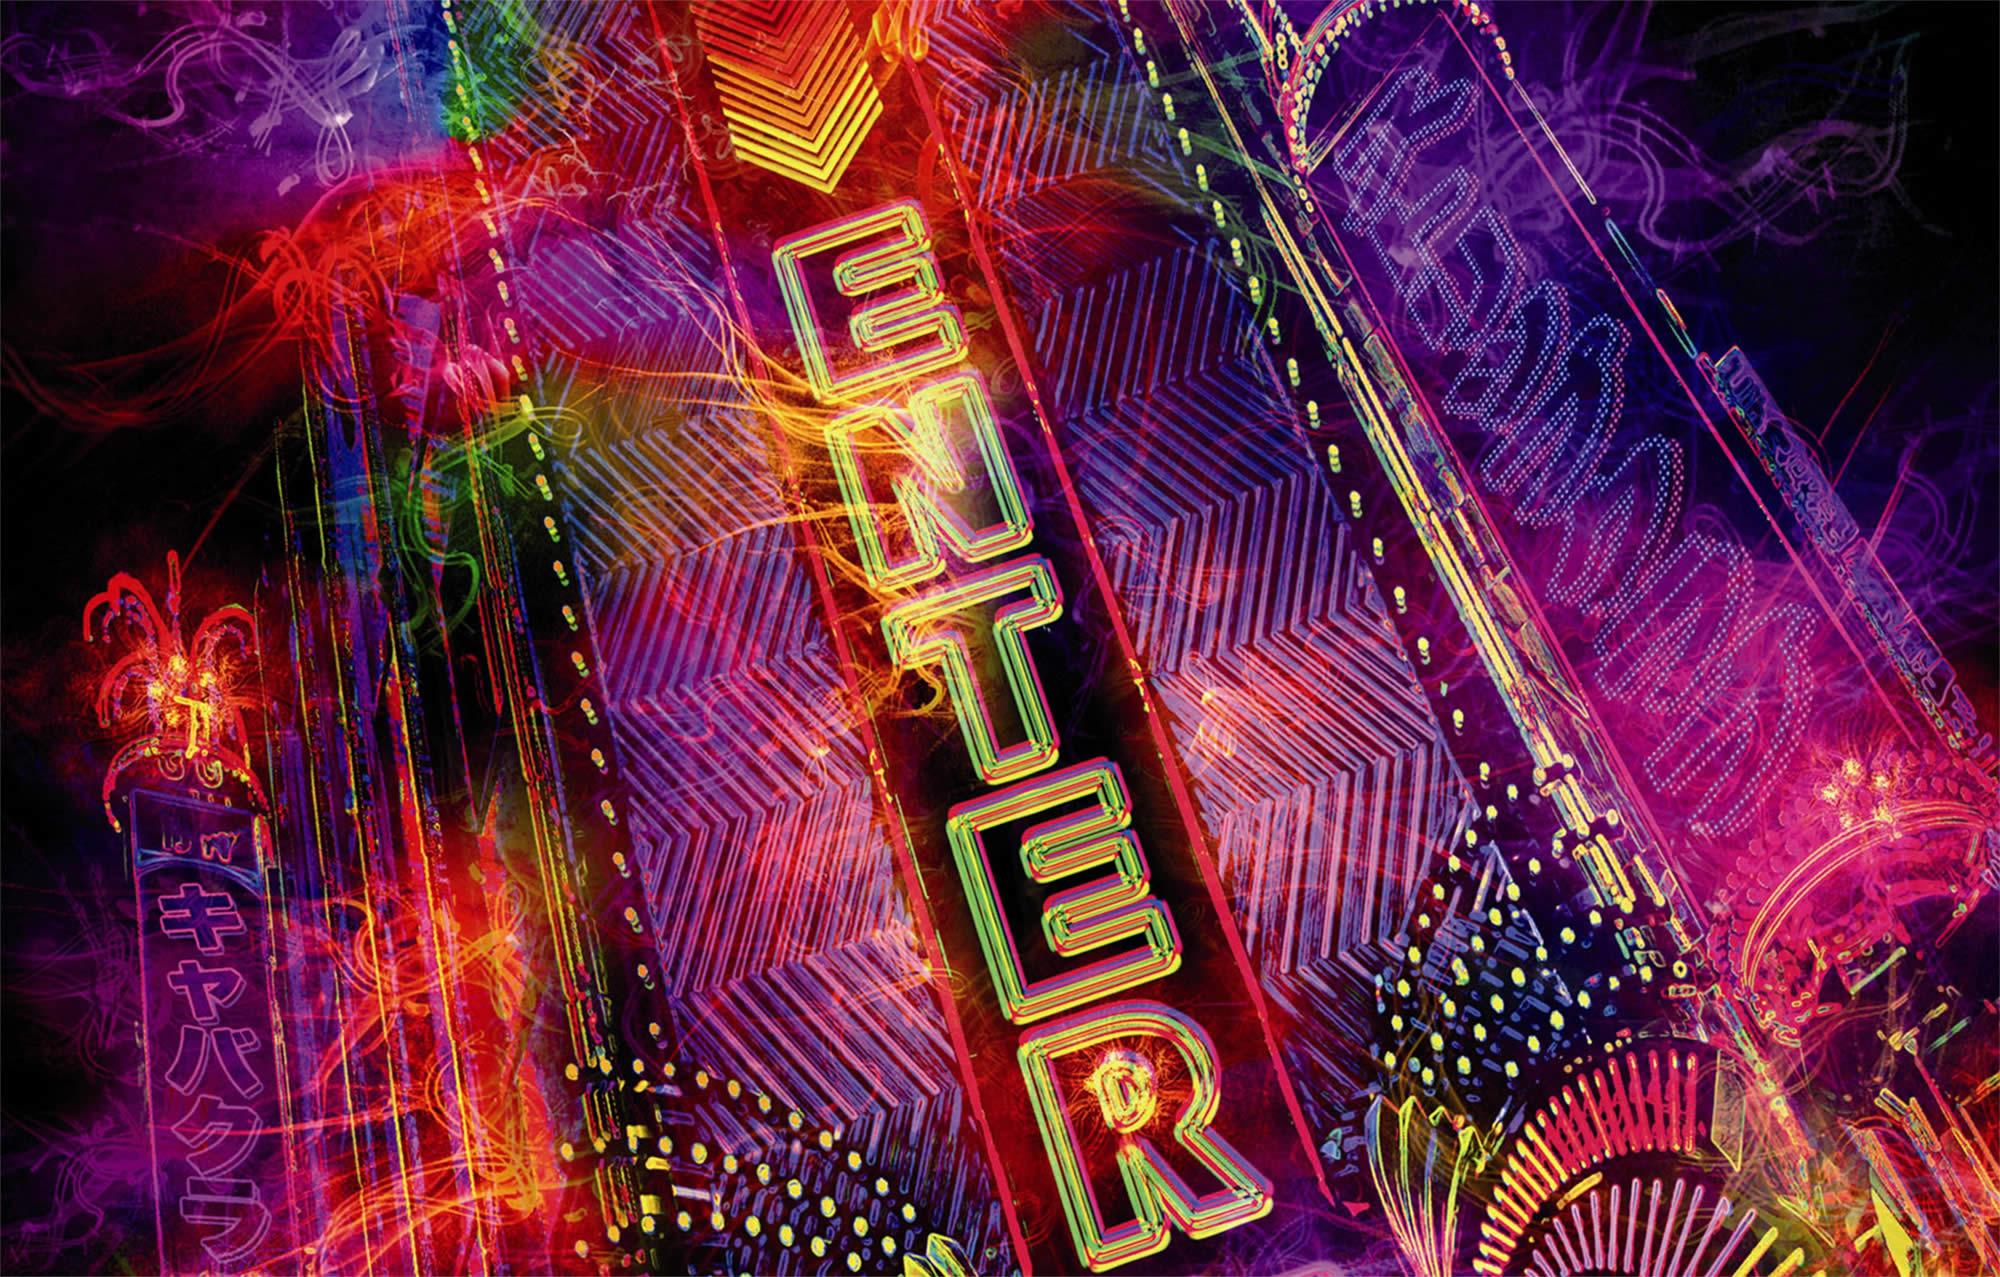 10 visually stunning movies with neon